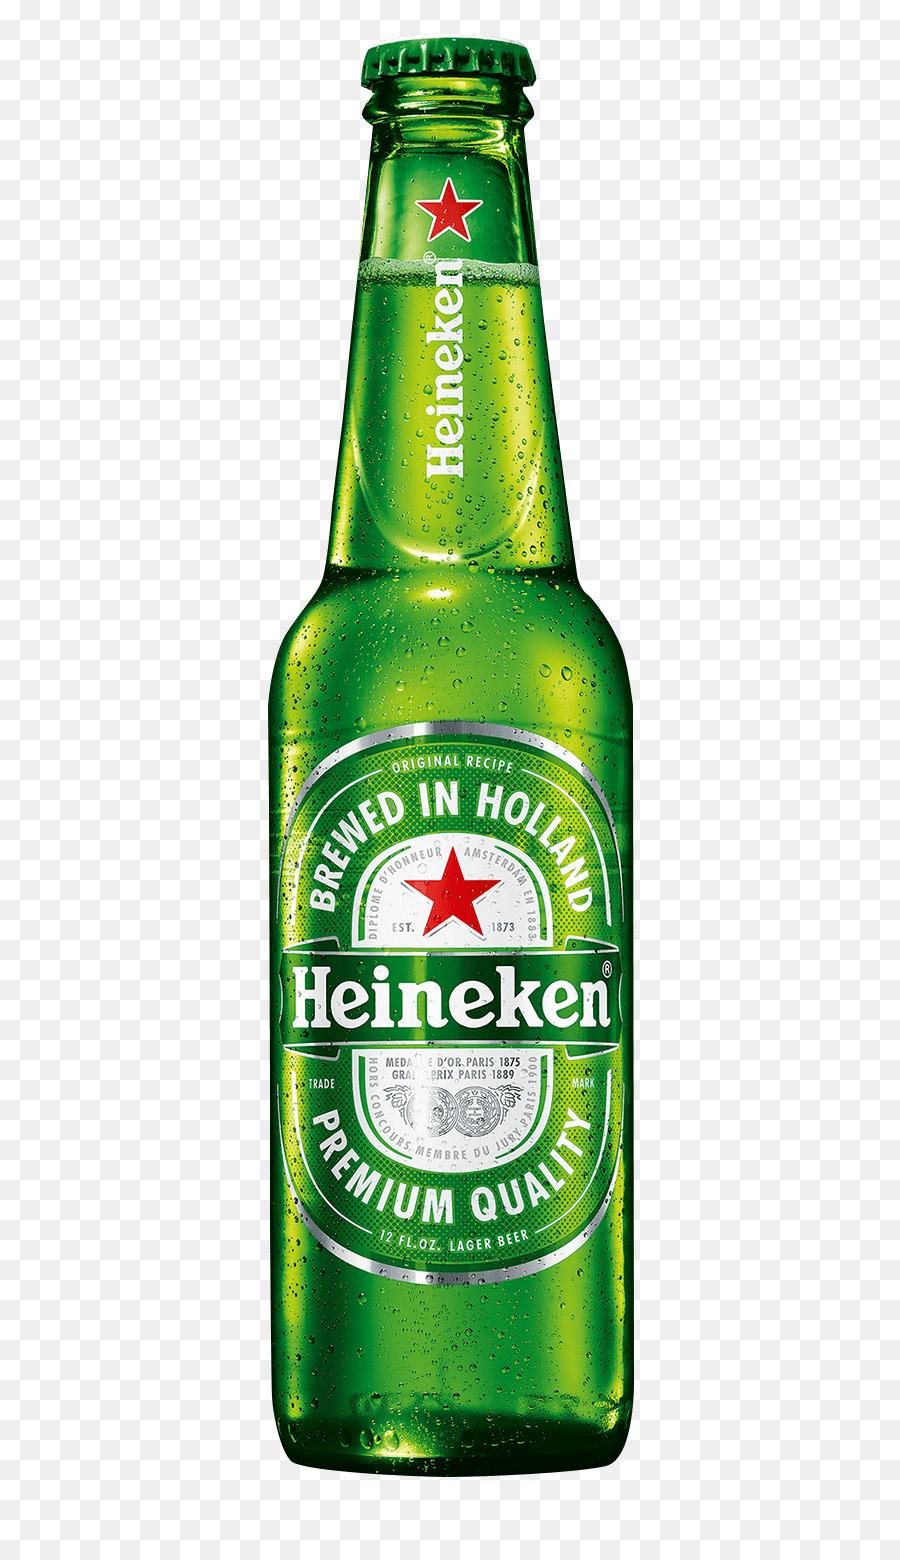 Heiniken Bier